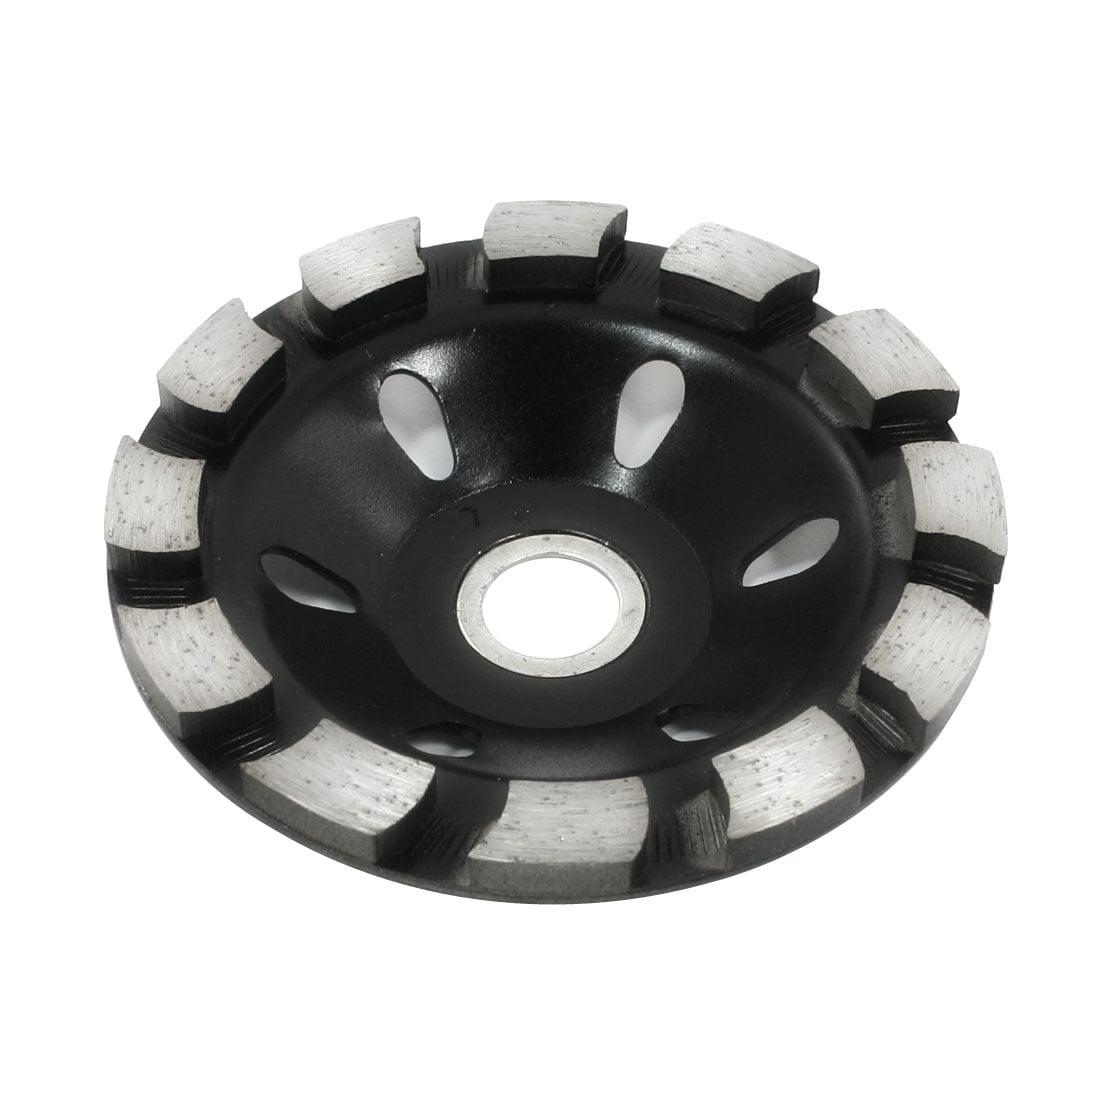 100 x 7 x 23mm Polishing Ceramic Concrete Grinding Black Silver Tone